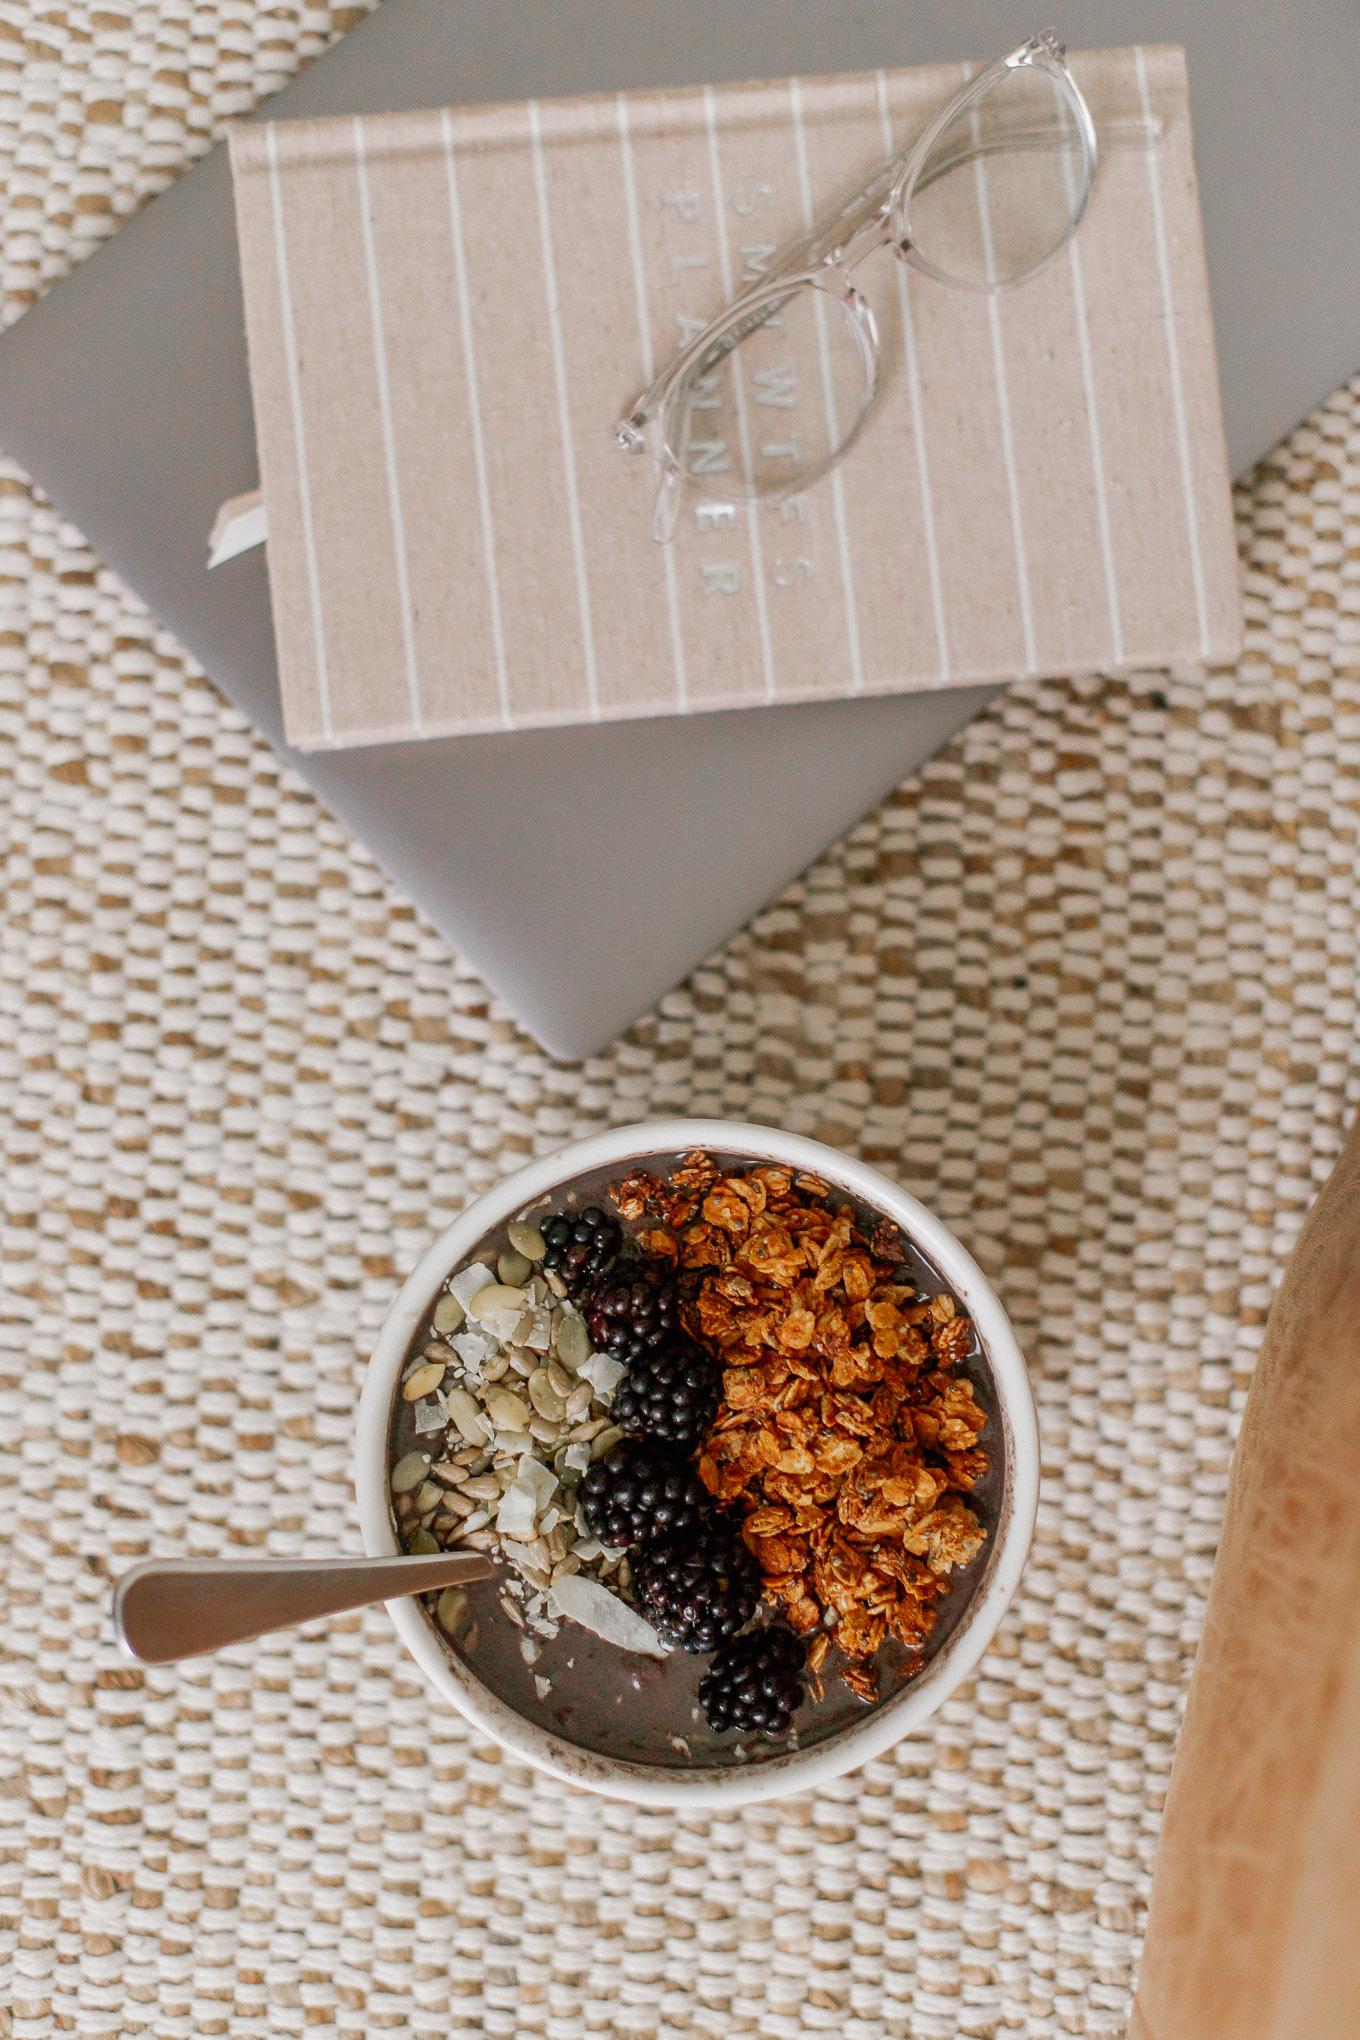 Easy Acai Bowl Recipe to Make at Home   Louella Reese